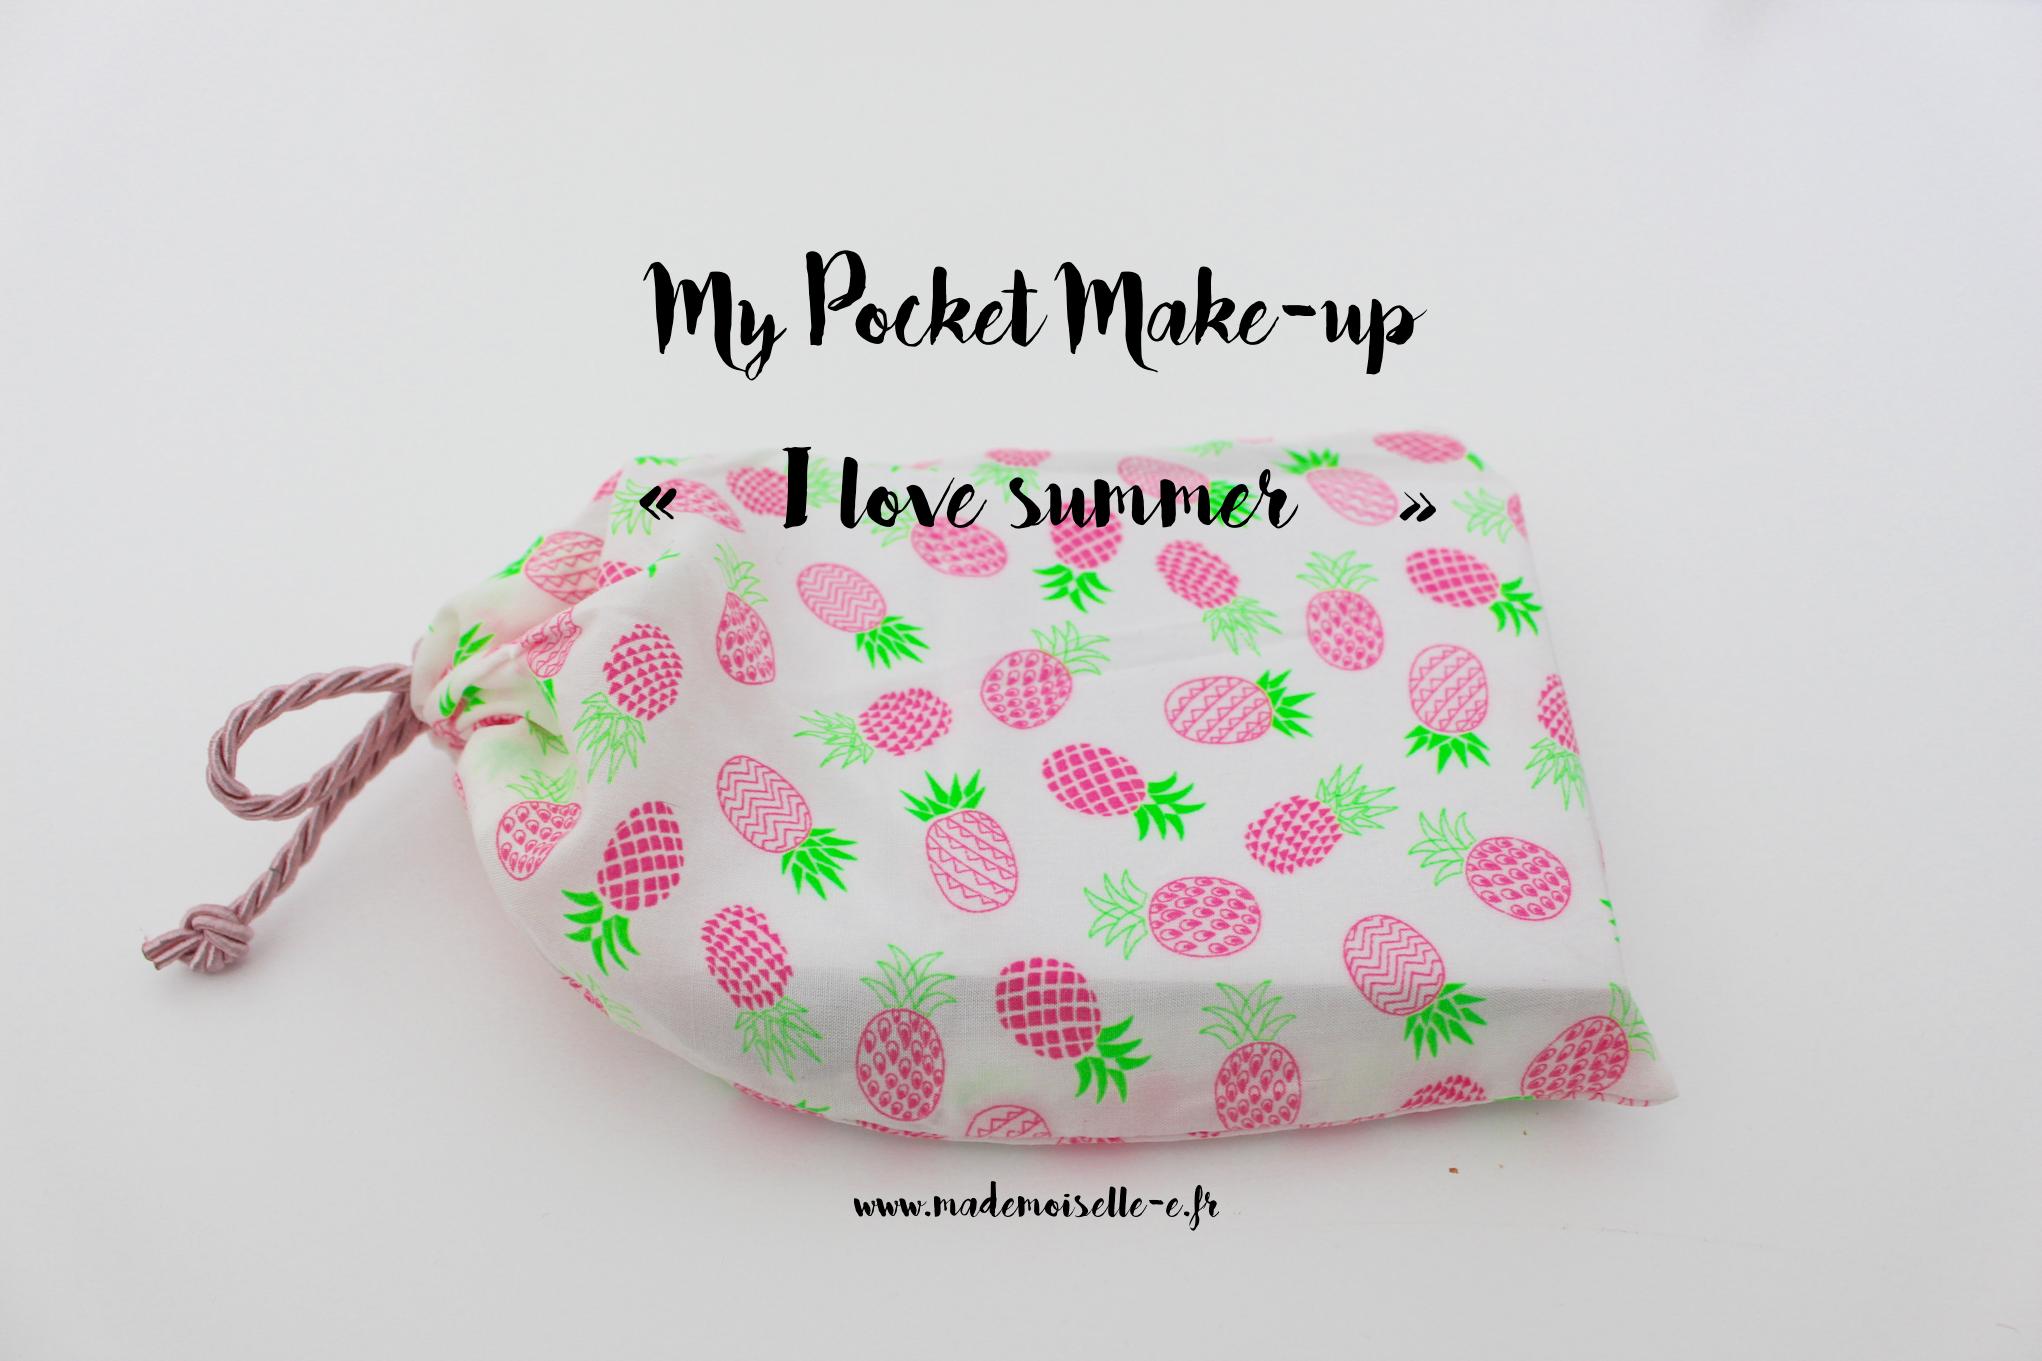 I love summer presentation_mademoiselle-e